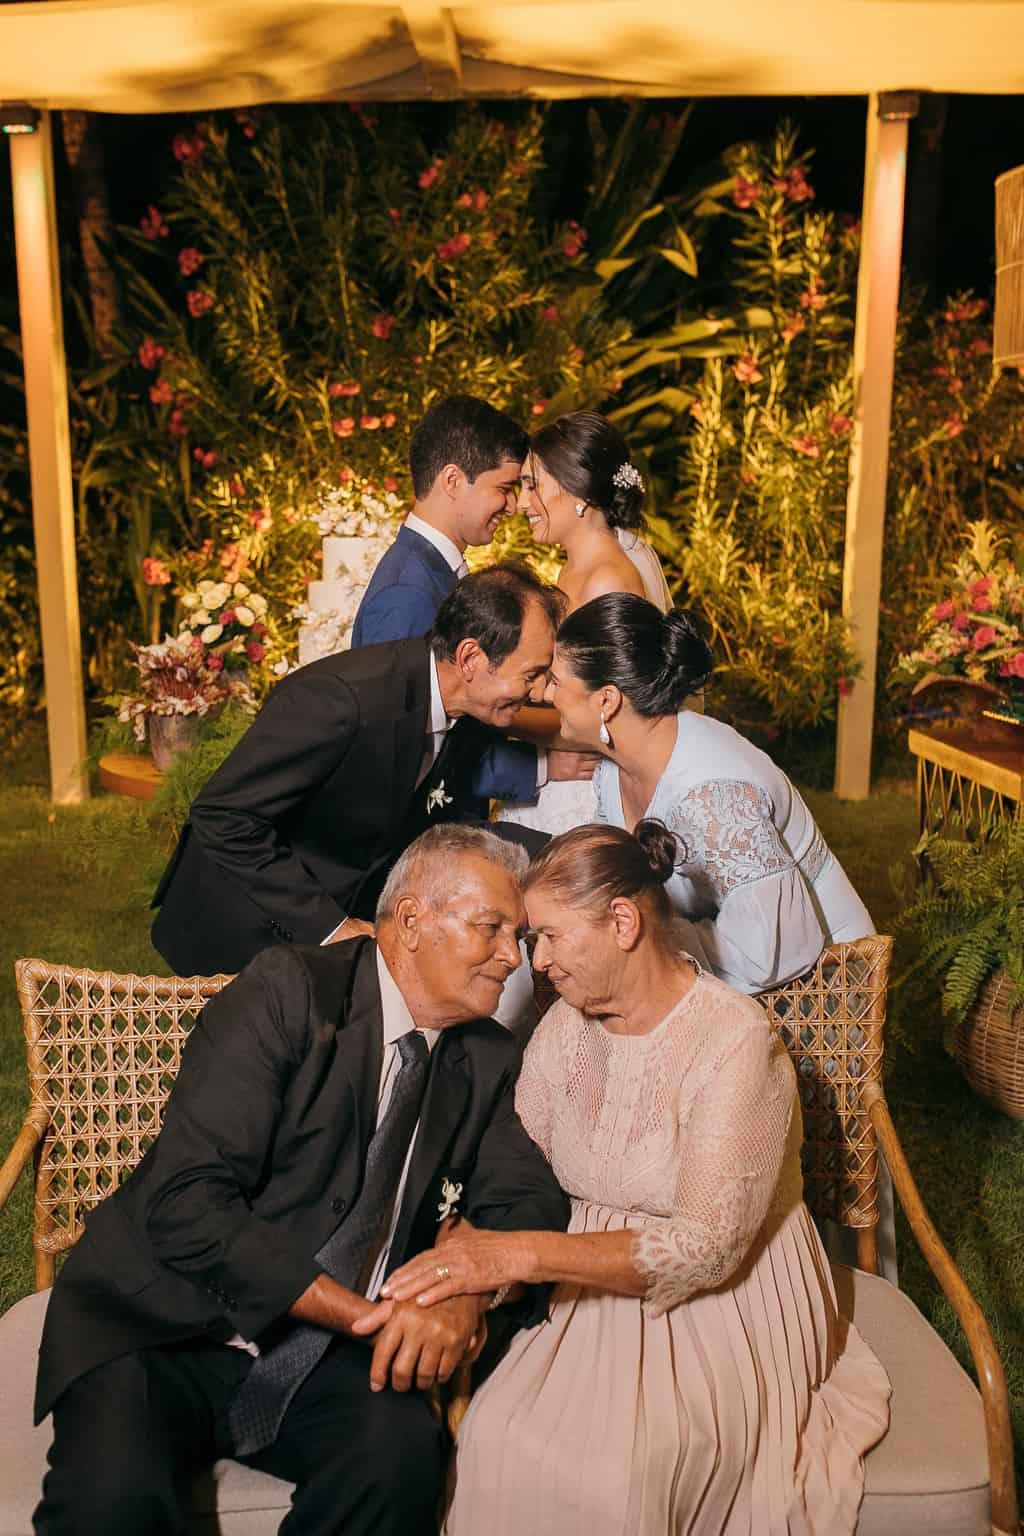 Casamento-Gardenia-e-Marcos-Antonio-Paulo-Bezerra-Joao-Curvelo-Carol-Maiorano-Foto-familia-1